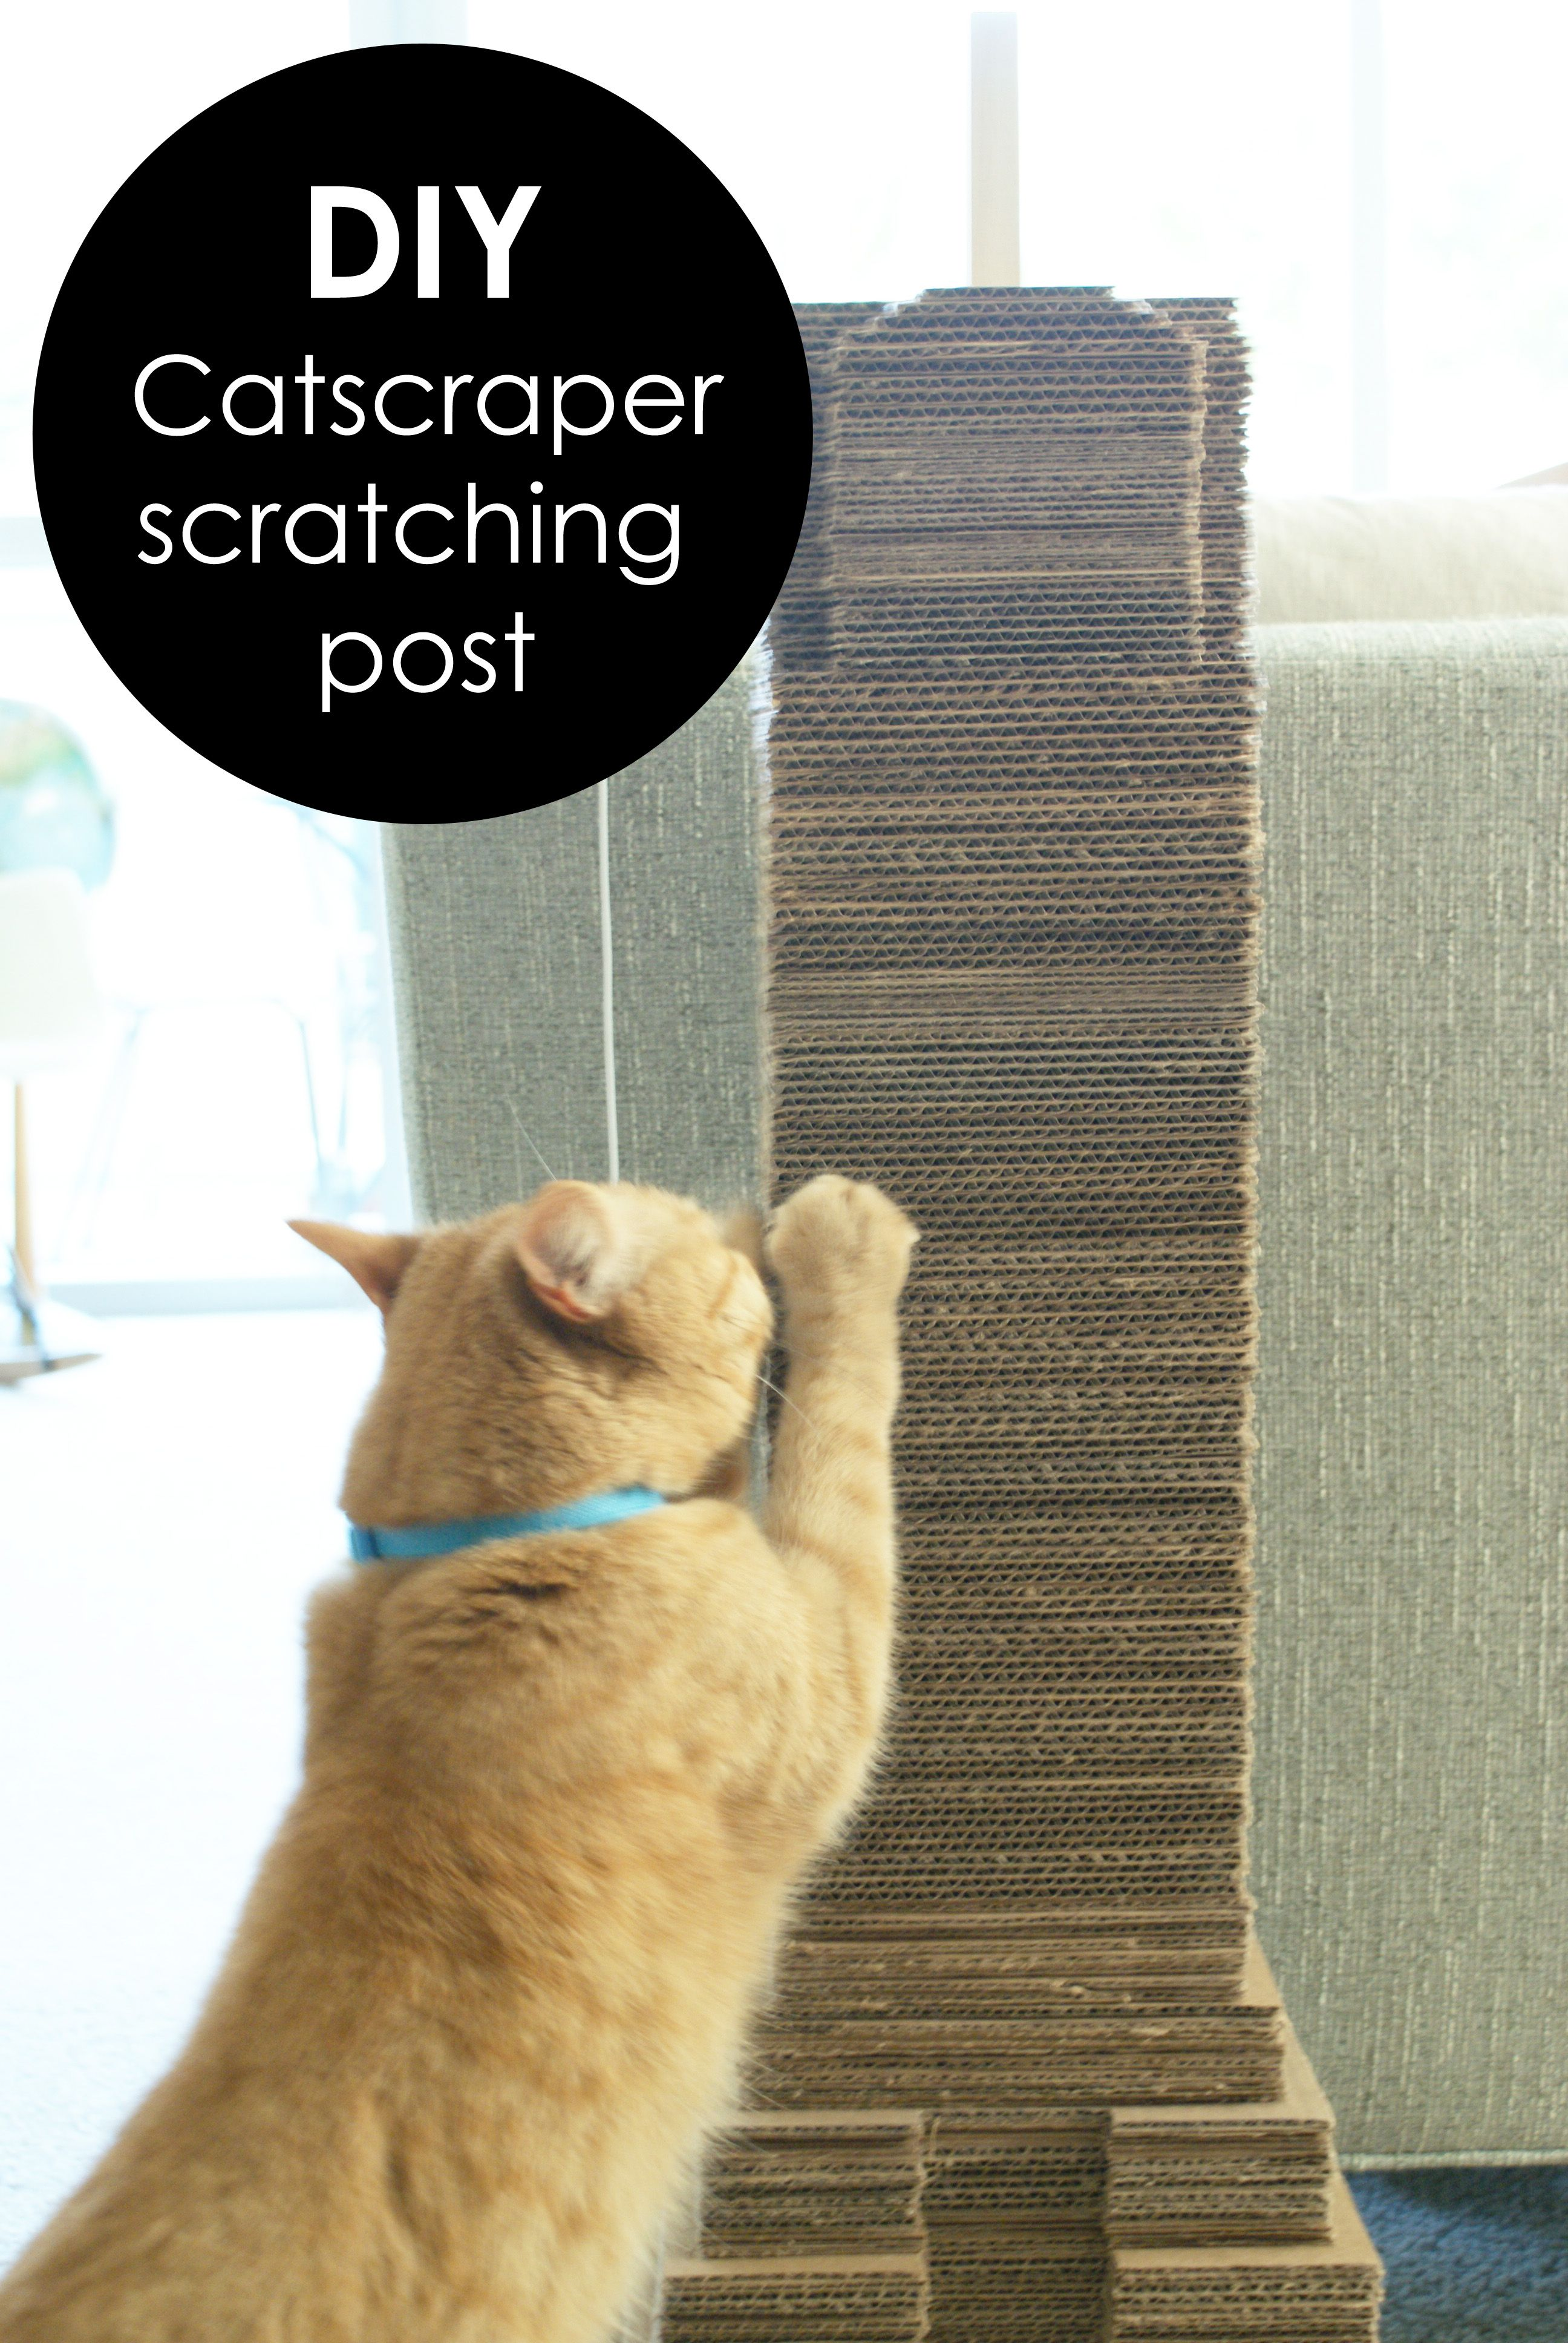 Diy Homemade Cat House Plans Wooden Pdf Wooden Yurt Plans Diy Cat Scratching Post Cat Scratching Post Cat Diy